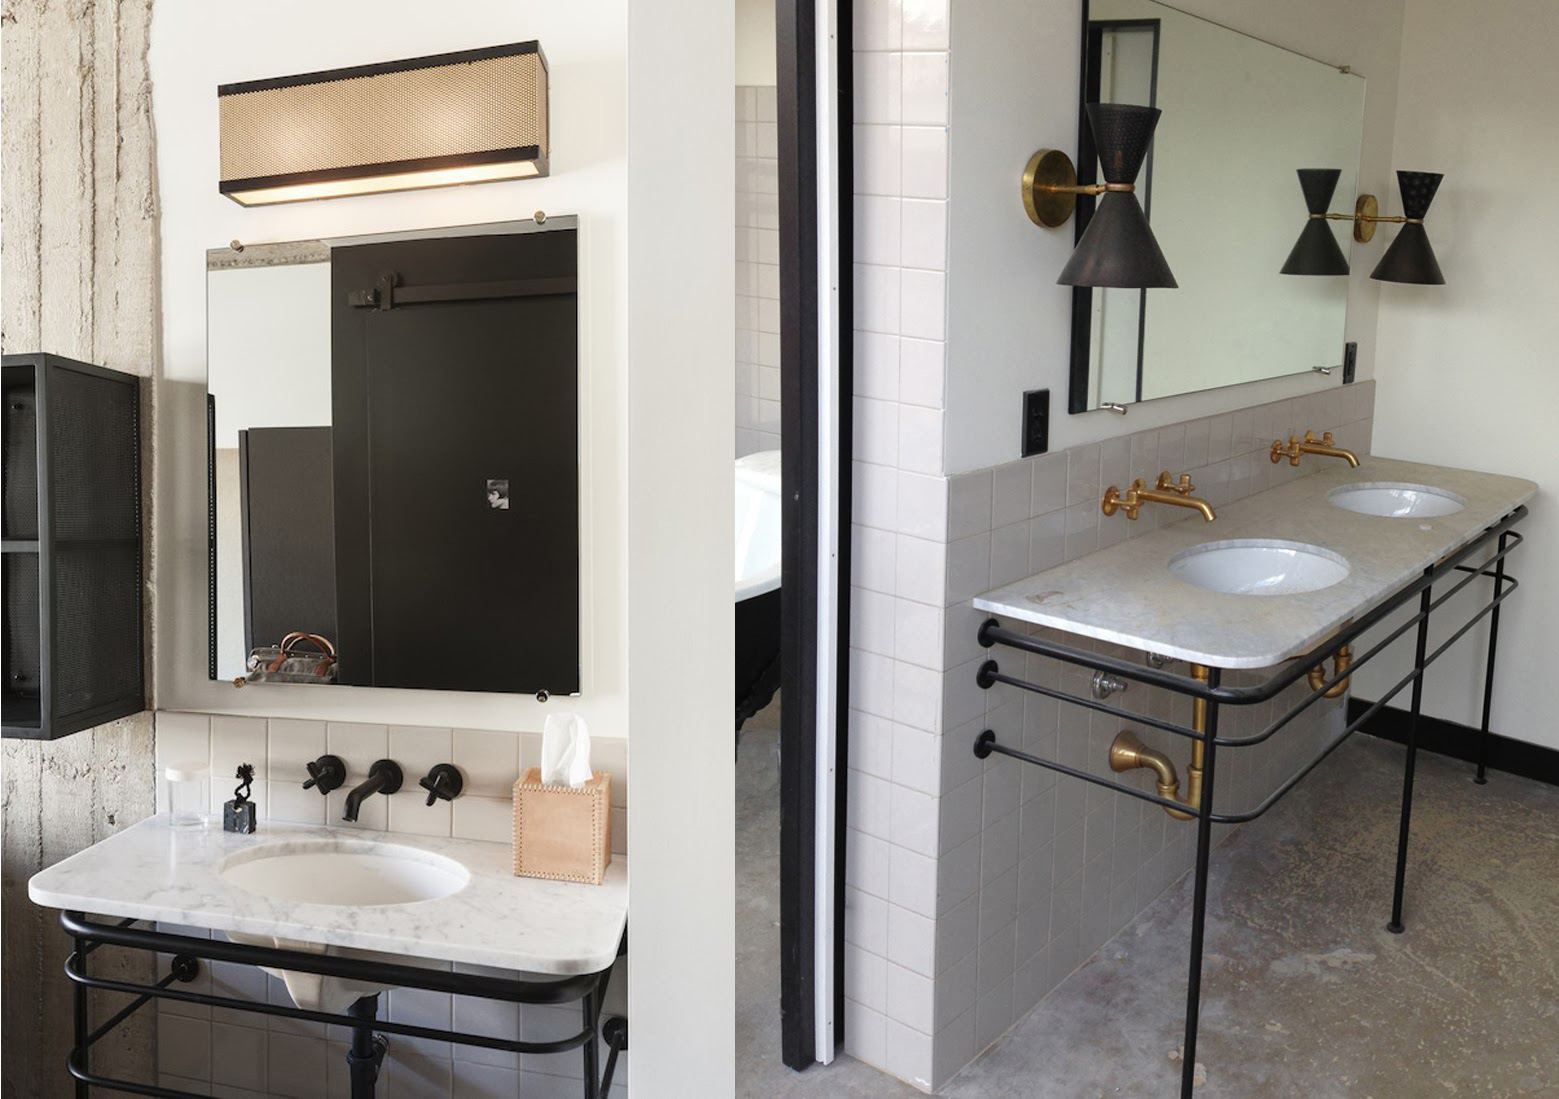 guest-room-bathroom-at-ace-hotel-downtown-los-angeles-via-kishani-perera-blog.jpg